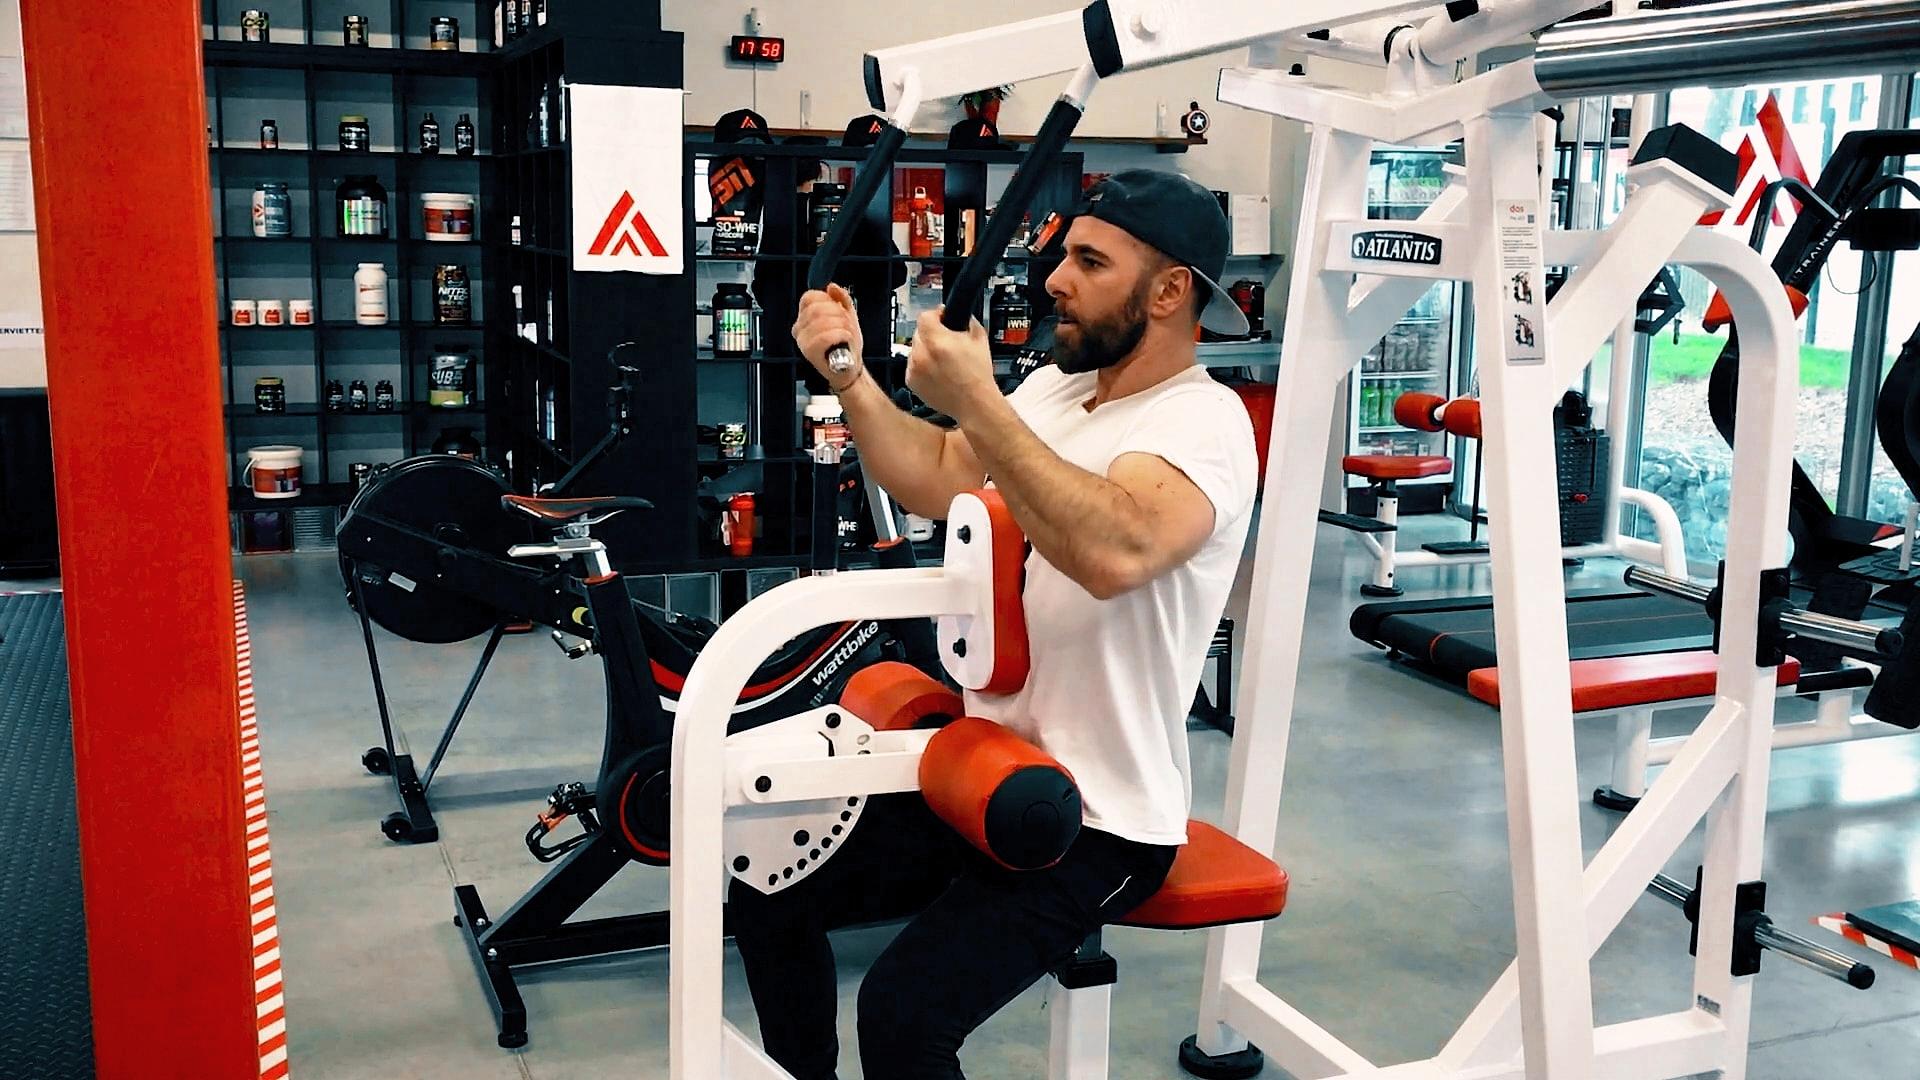 Programme-Musculation-Prise-de-masse.jpg